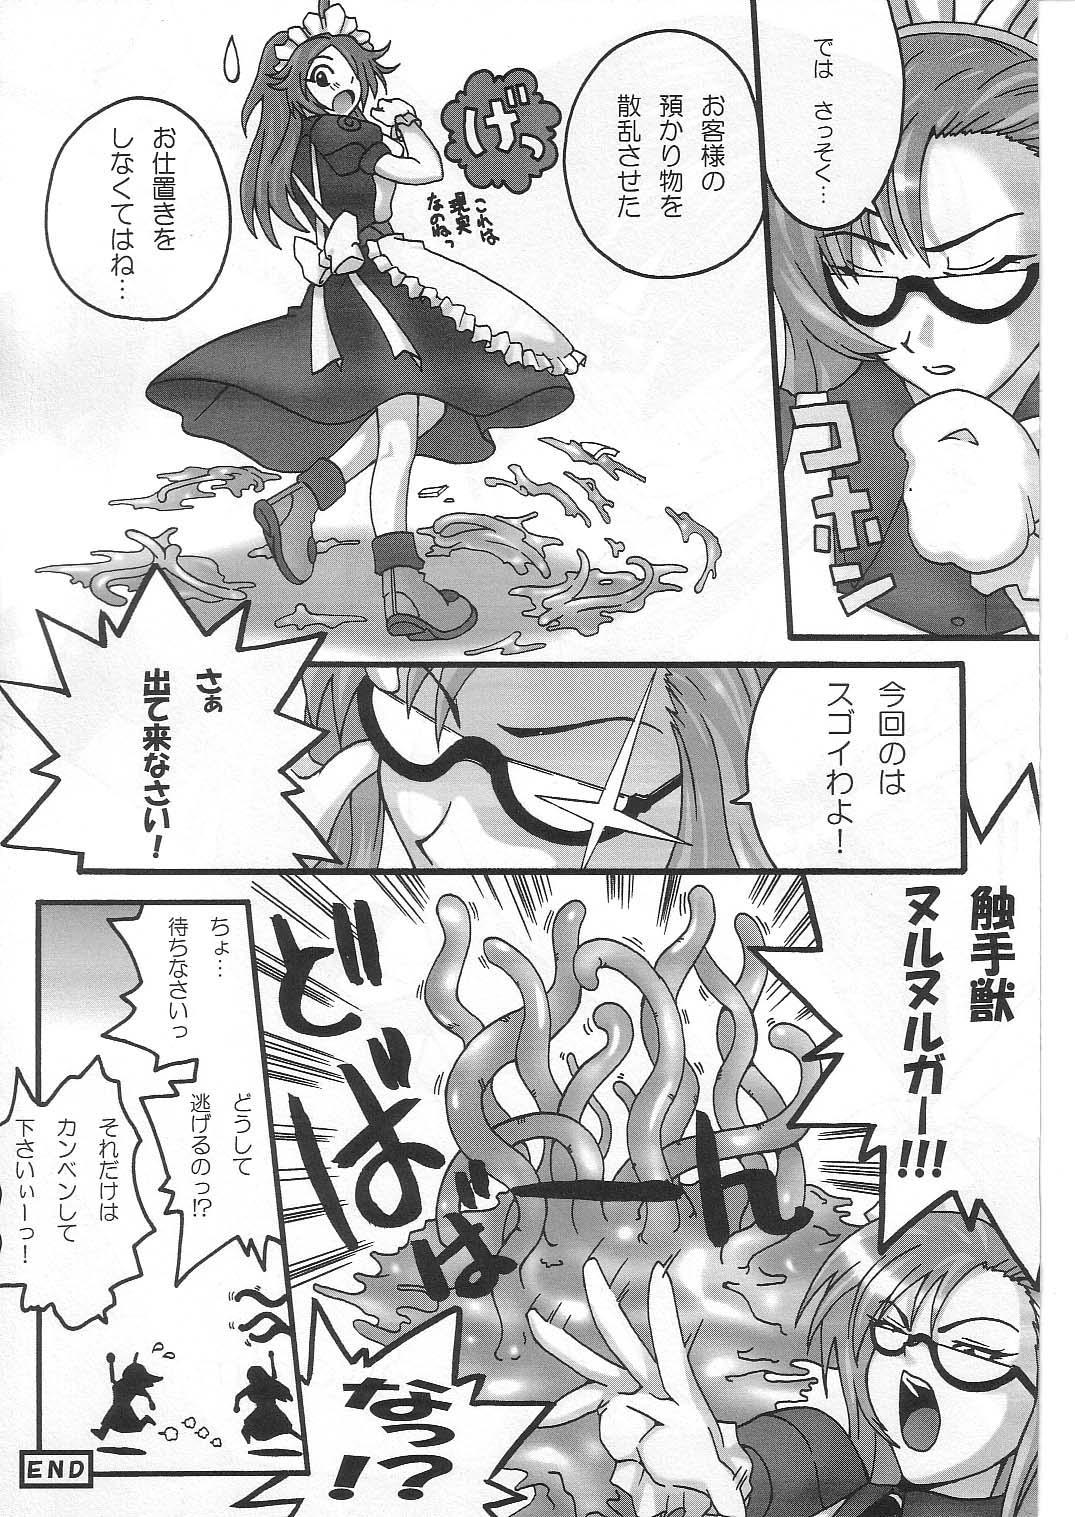 Kapura-san ga Koronda 26